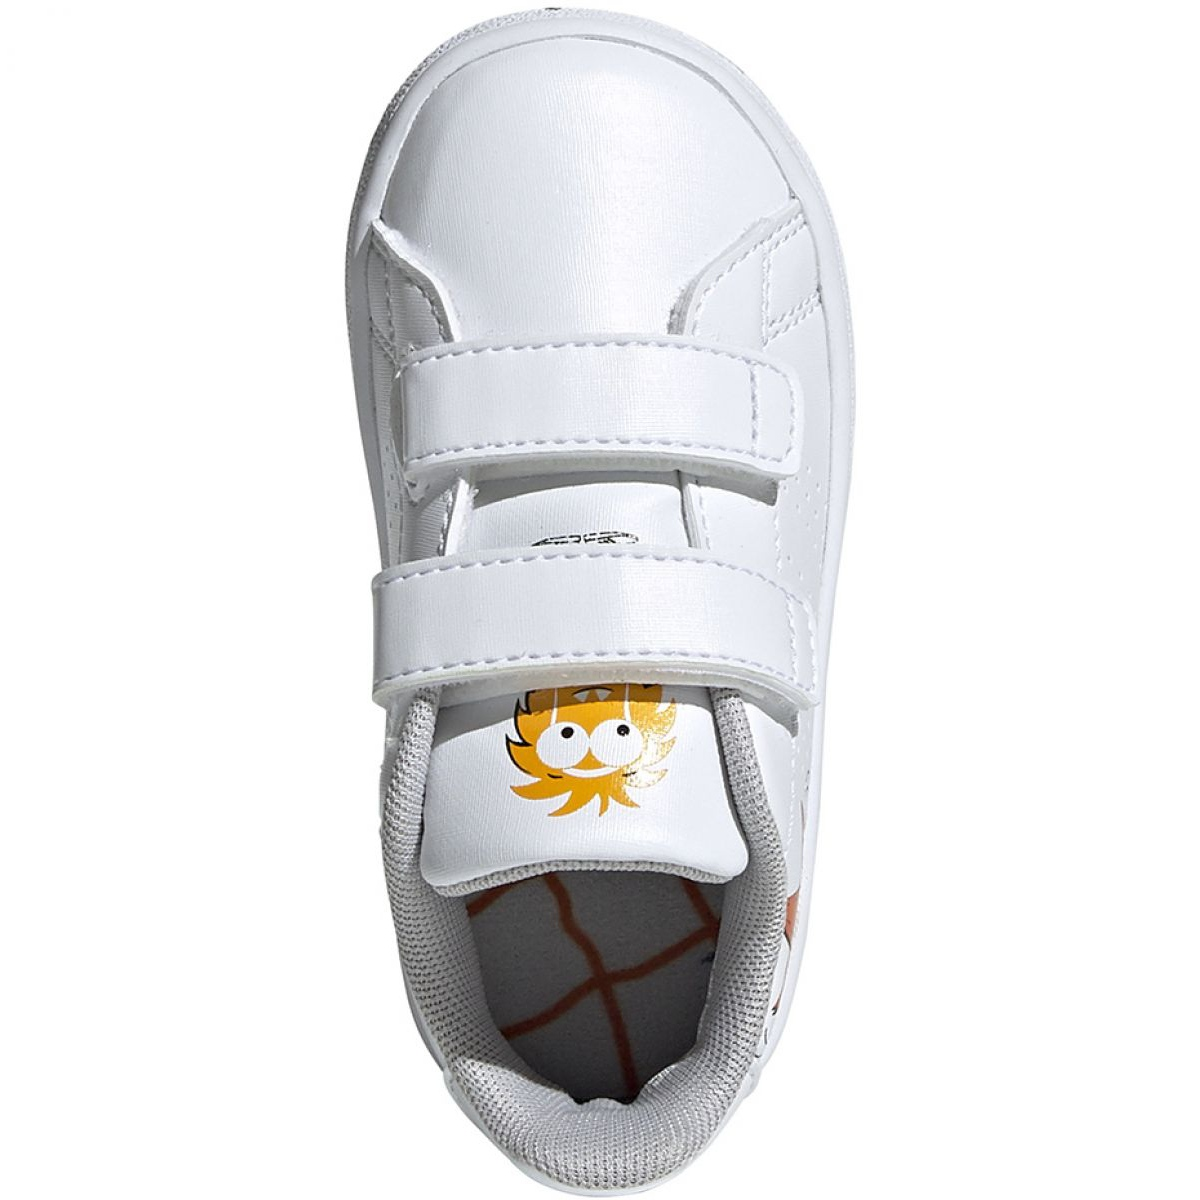 Sapatos Adidas Advantage I Jr EF0305 branco